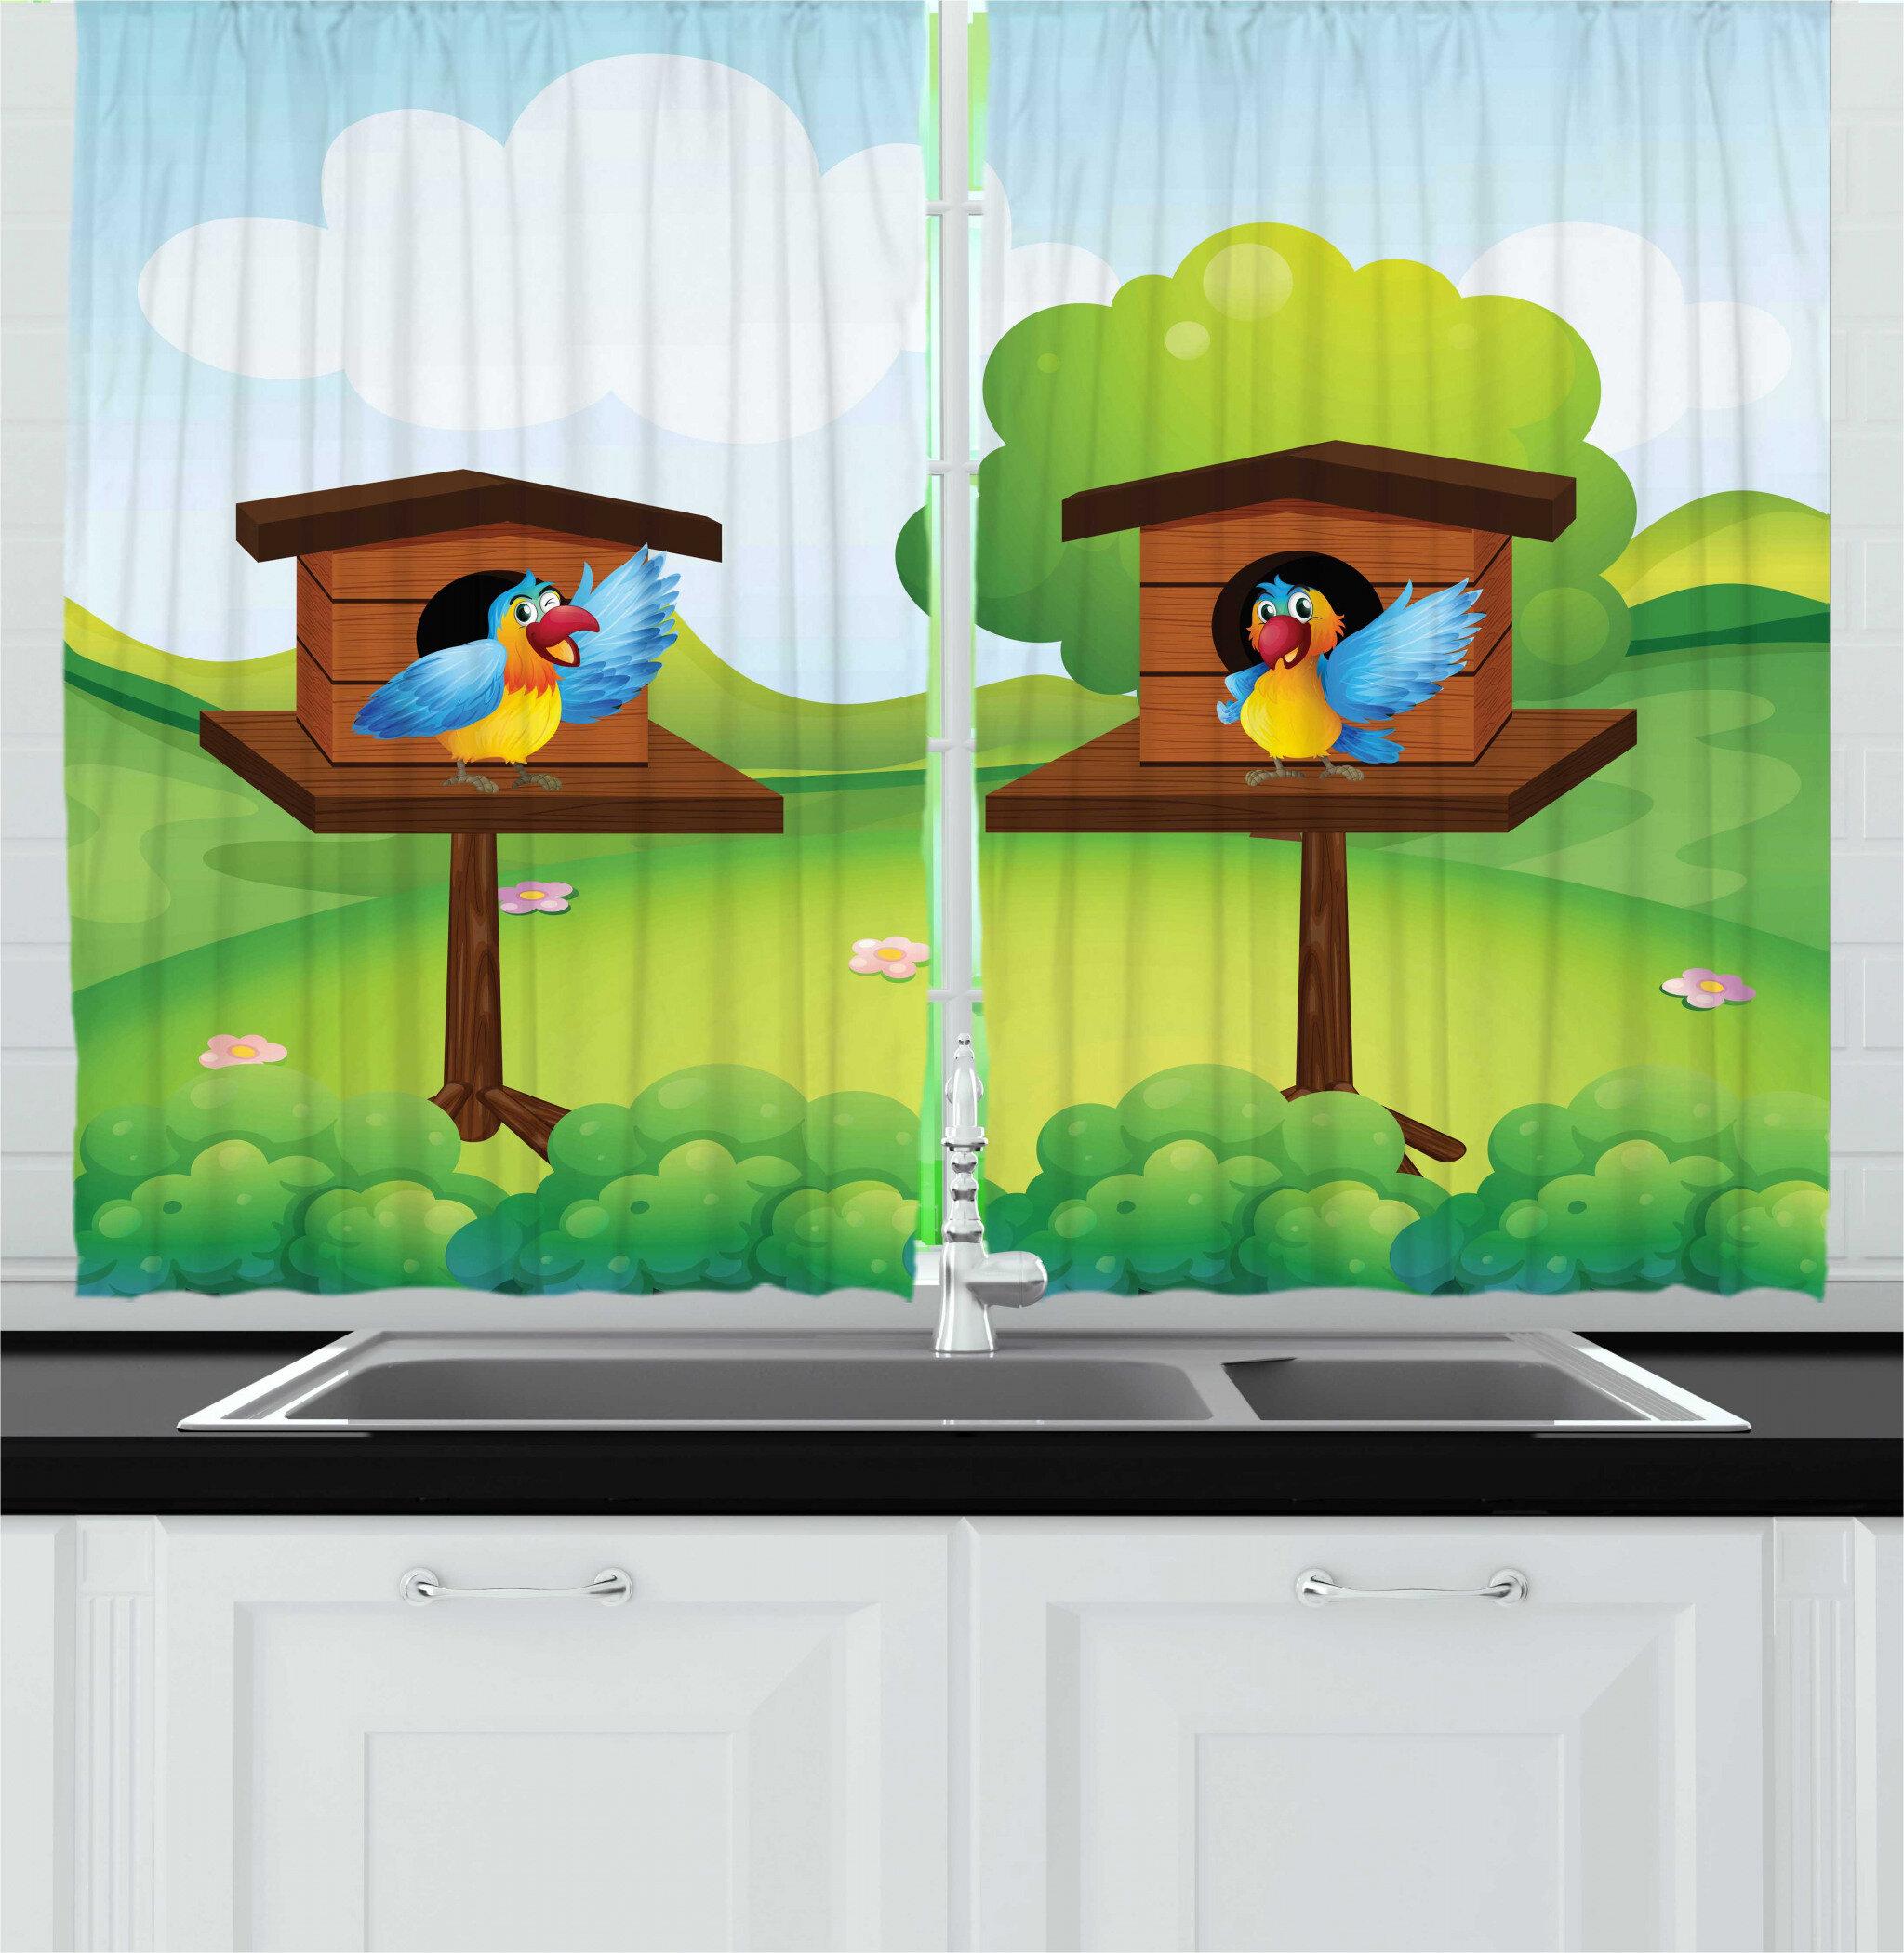 East Urban Home 2 Piece Birdhouse Happy Winged Animals In Nest Tree Clouds Cartoon Design Nature Kitchen Curtain Set # birds, cartoon, nest, tree. wayfair